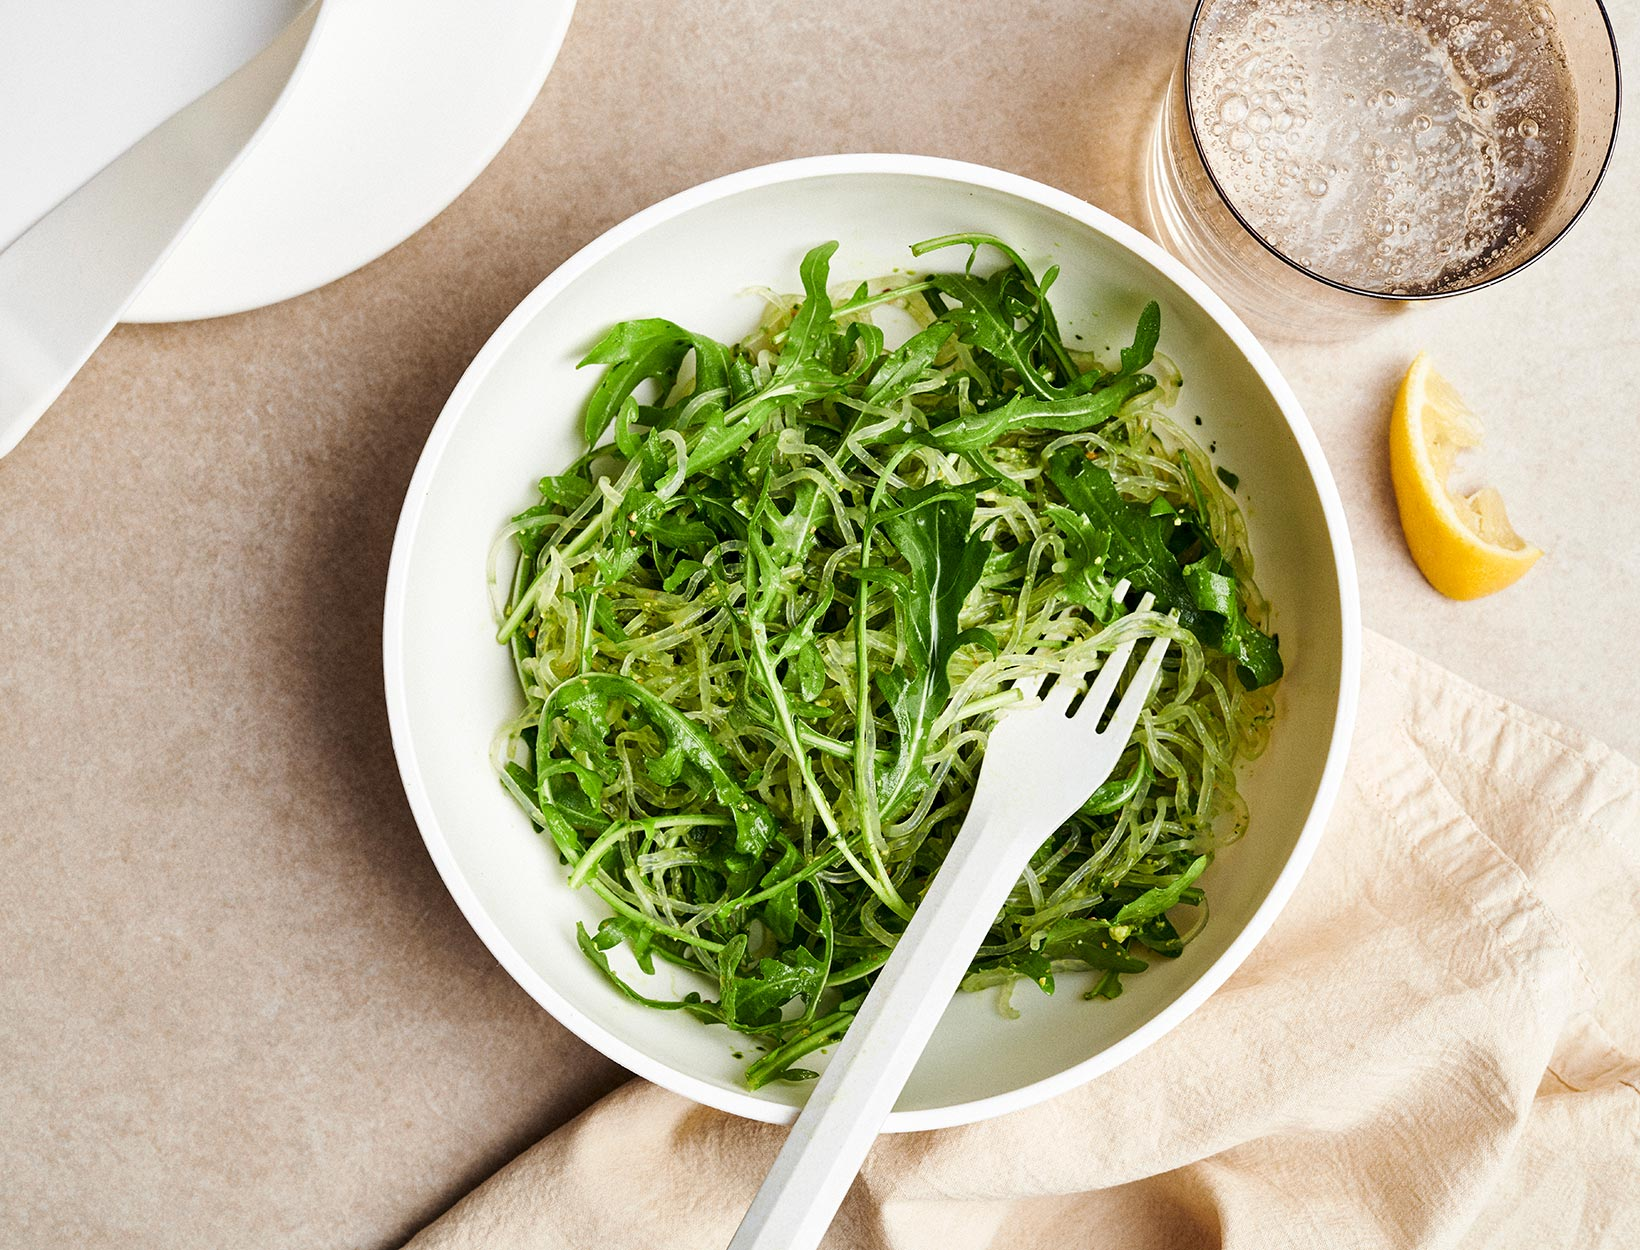 Pesto Kelp Noodle Salad with Arugula